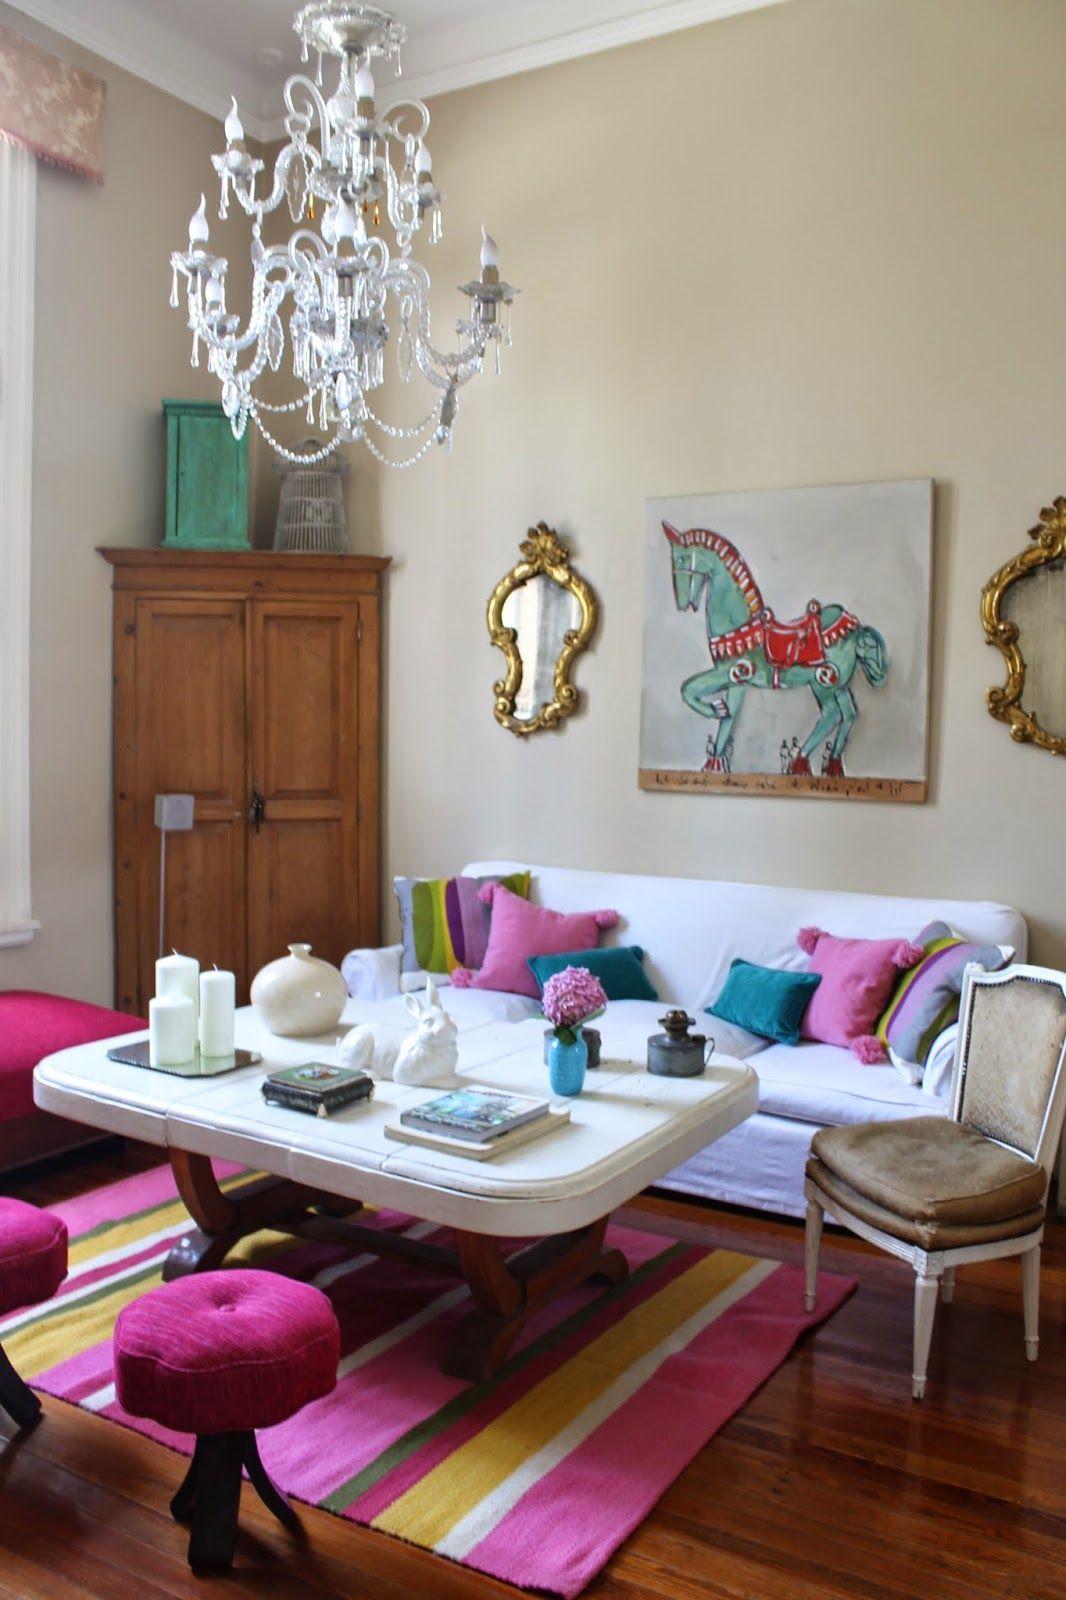 El living de mi casa: Vintage Deco Marce | Mi casa | Pinterest ...